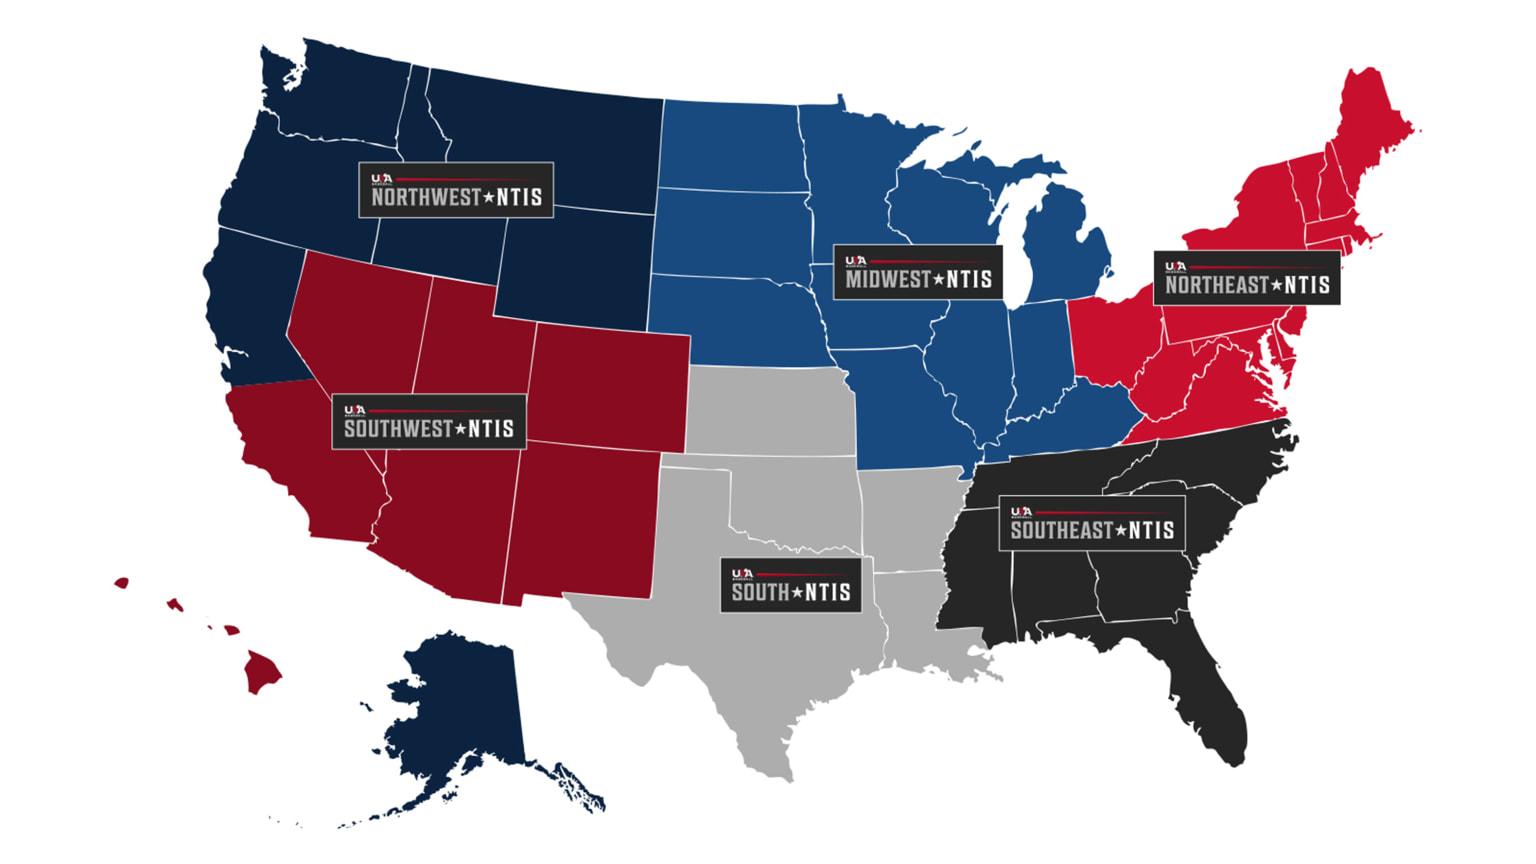 USA NTIS map